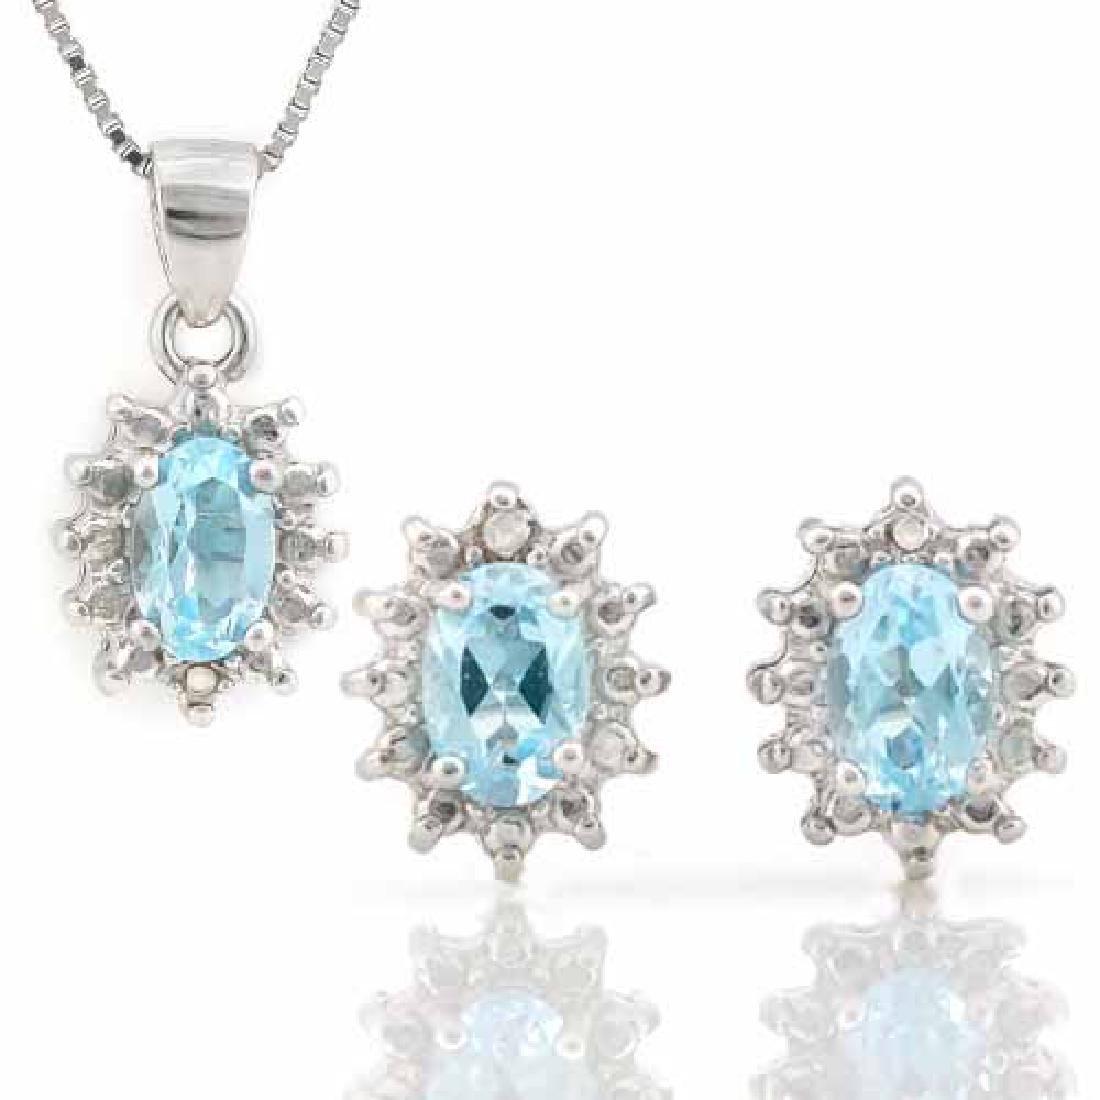 1 4/5 CARAT BABY SWISS BLUE TOPAZ & DIAMOND 925 STERLIN